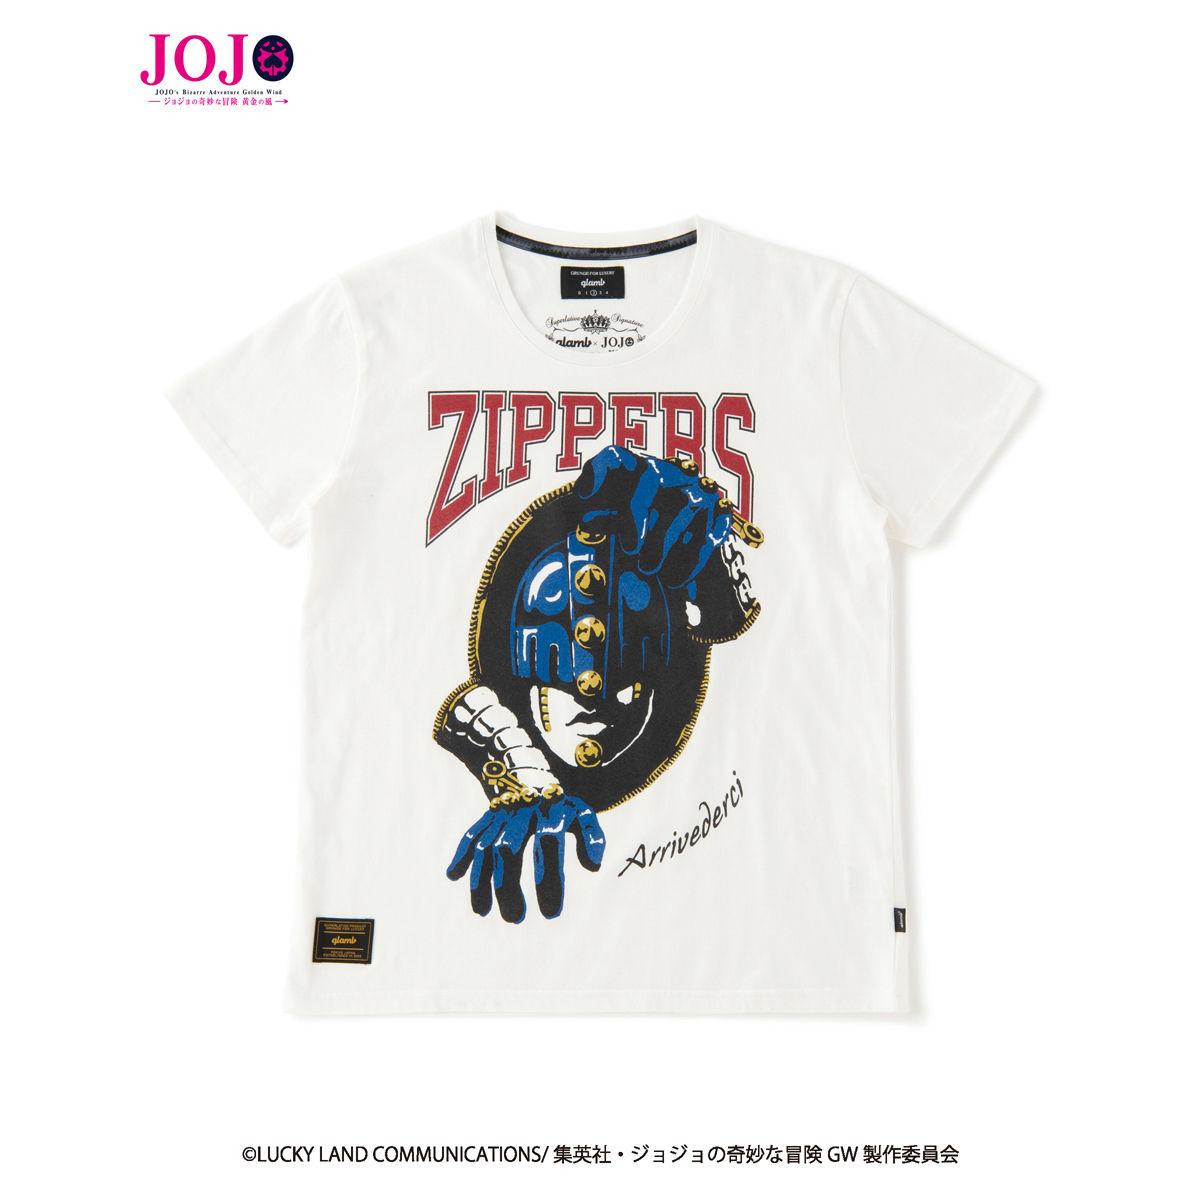 JoJo's Bizarre Adventure: Golden Wind × glamb collaboration